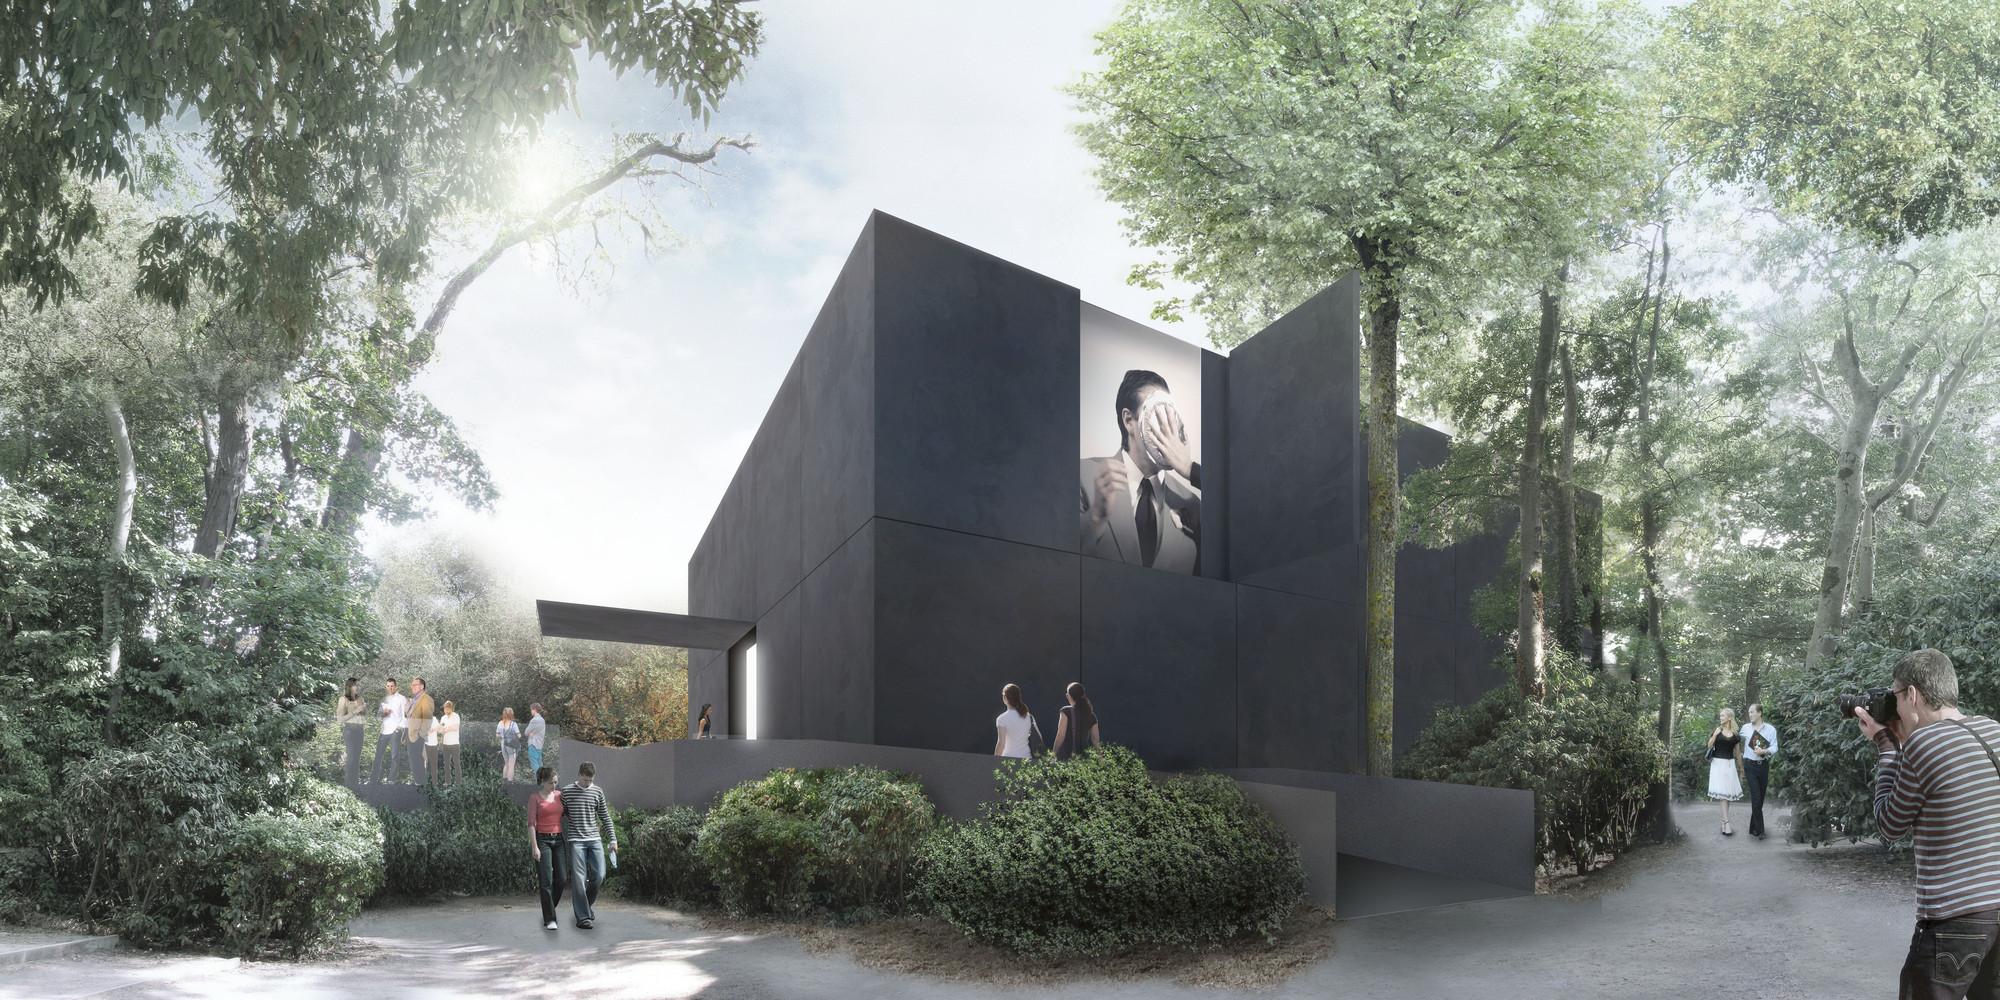 Denton Corker Marshall To Design First 21st Century Pavilion in Venice's Giardini, © Denton Corker Marshall